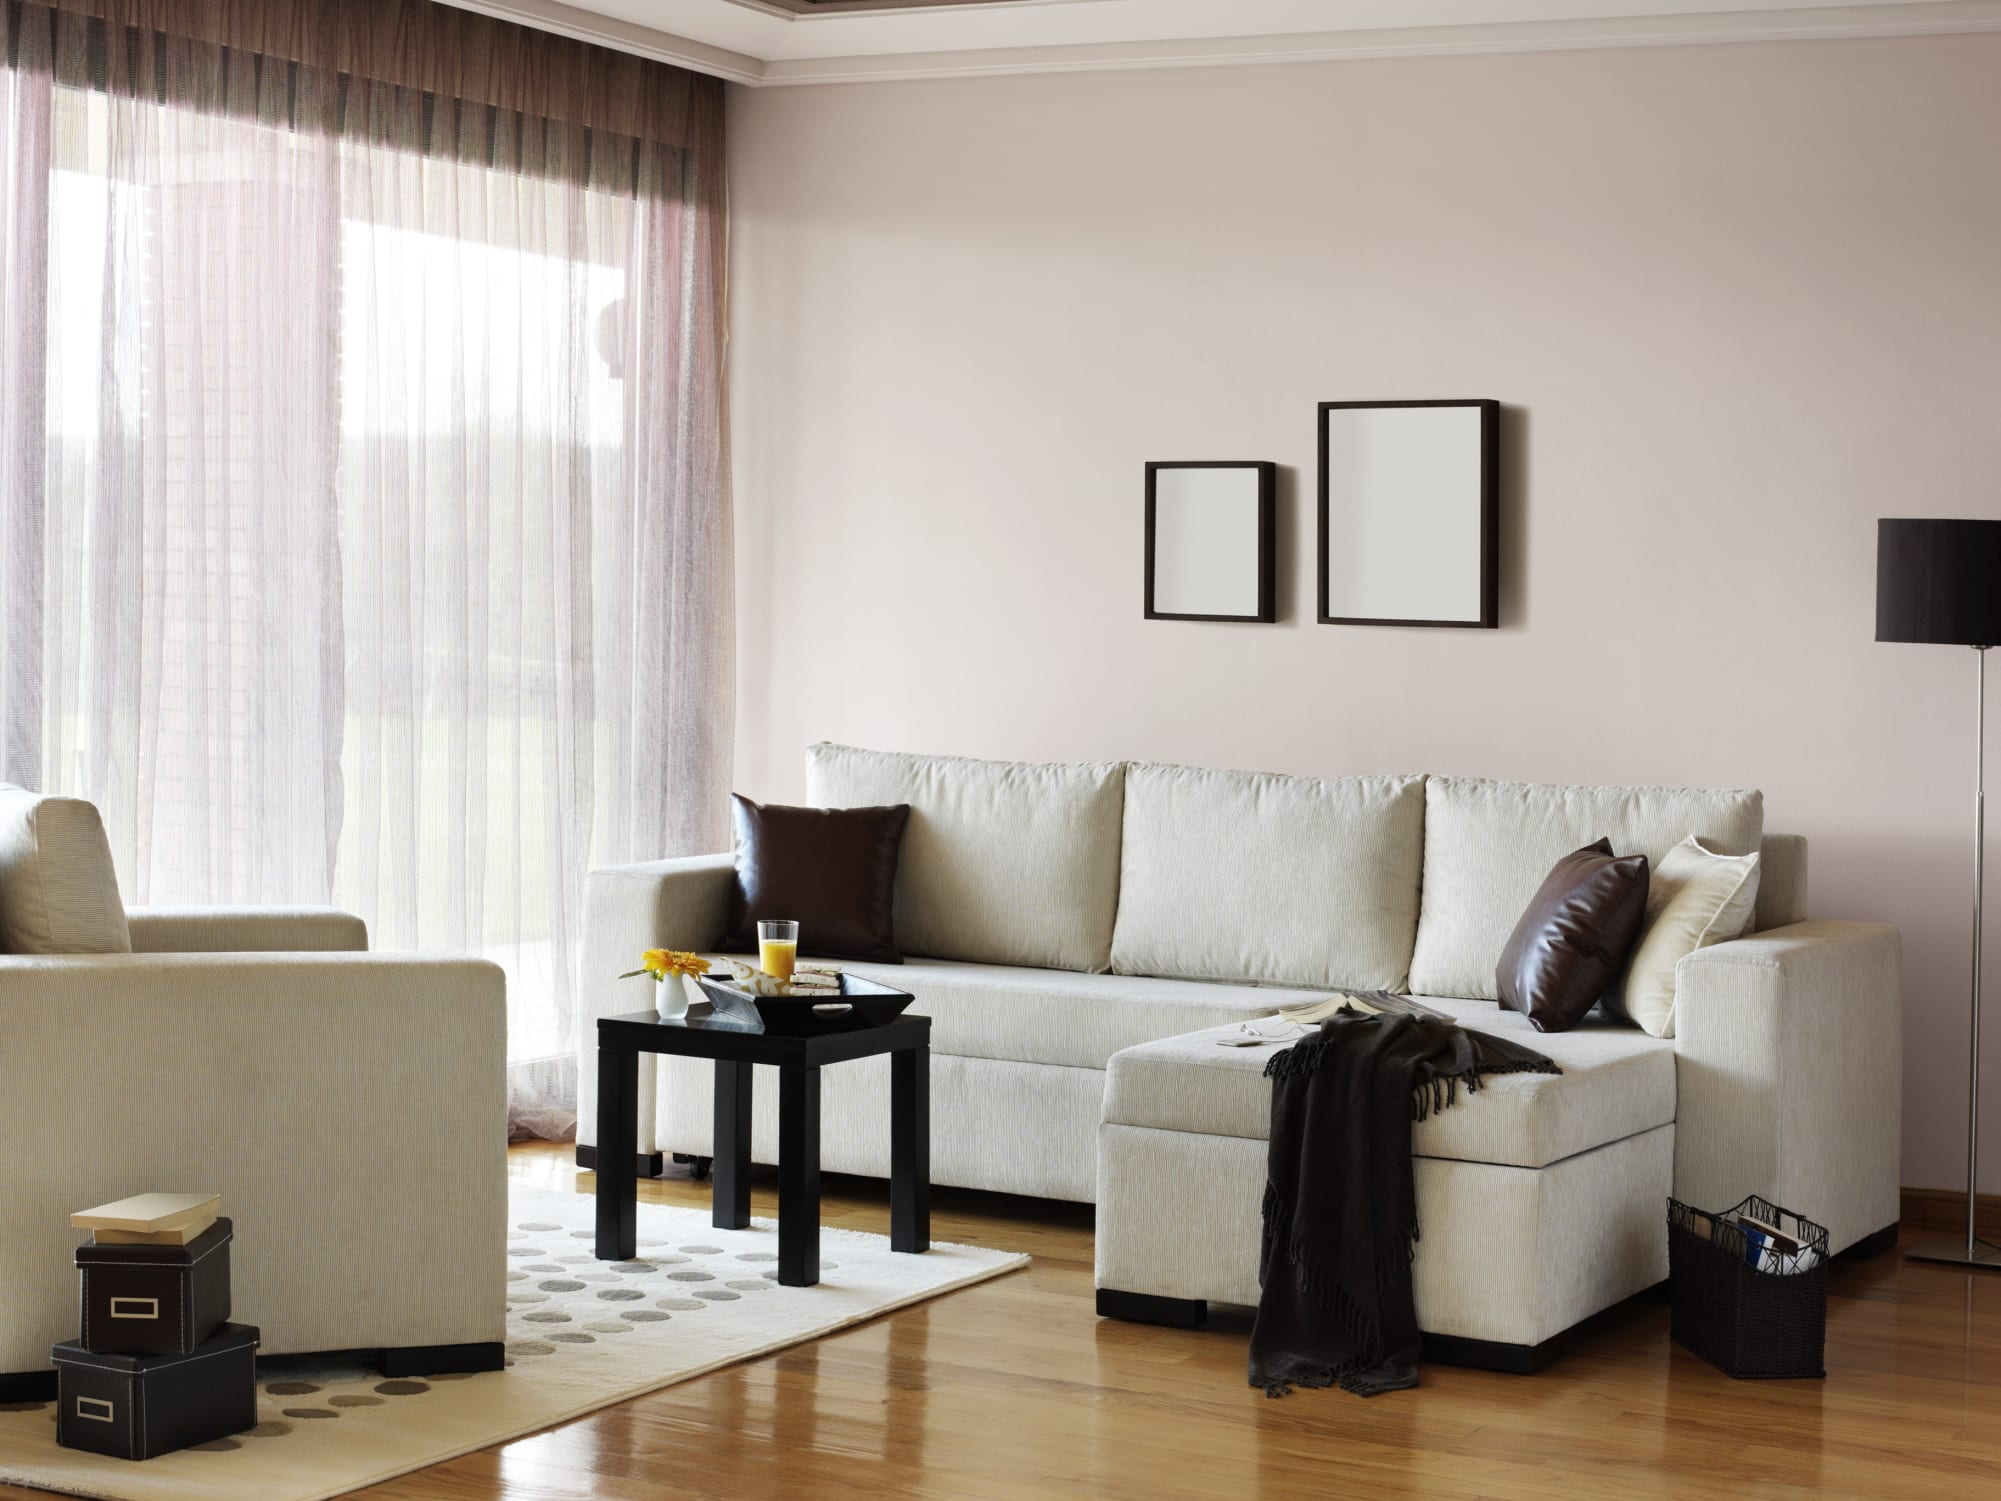 Consejos tiles para decorar tu nuevo hogar for Consejos decorar casa